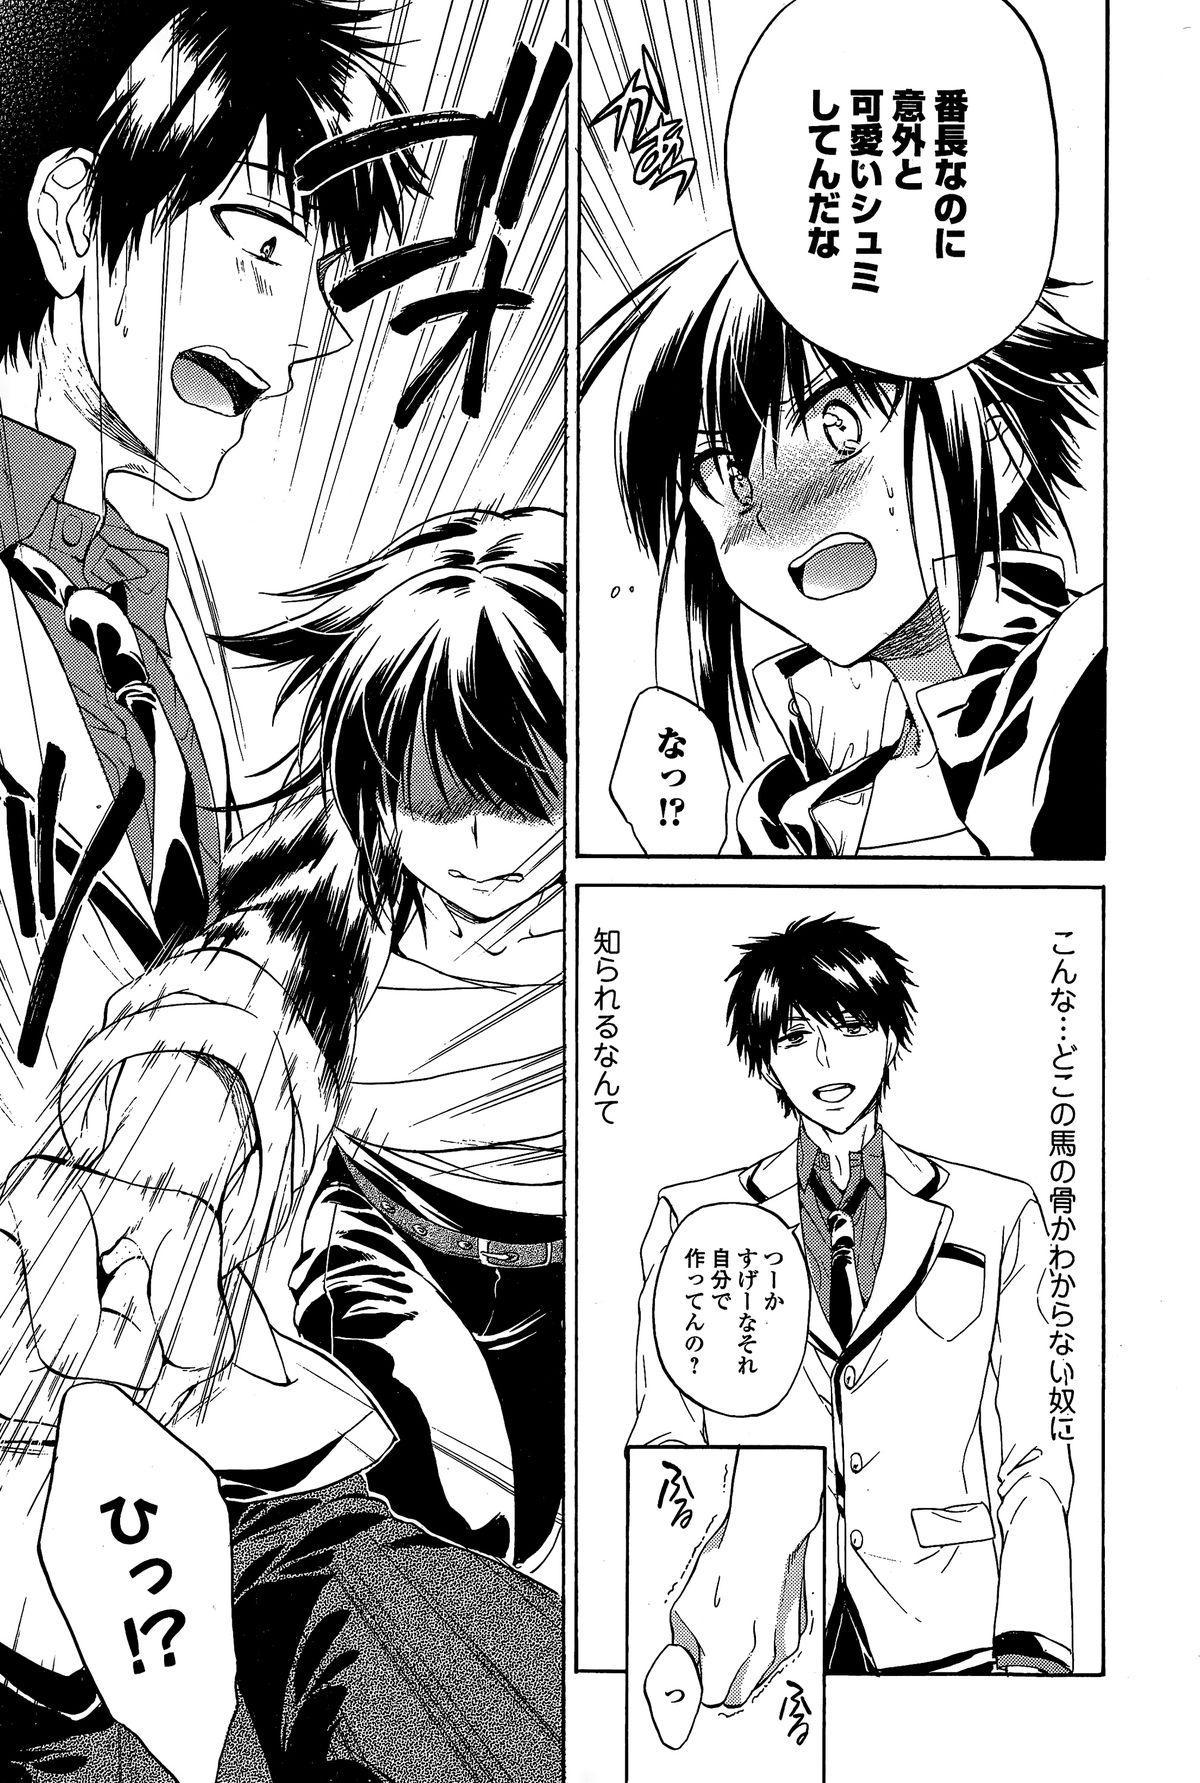 Comic Toutetsu 2015-02 Vol. 3 104